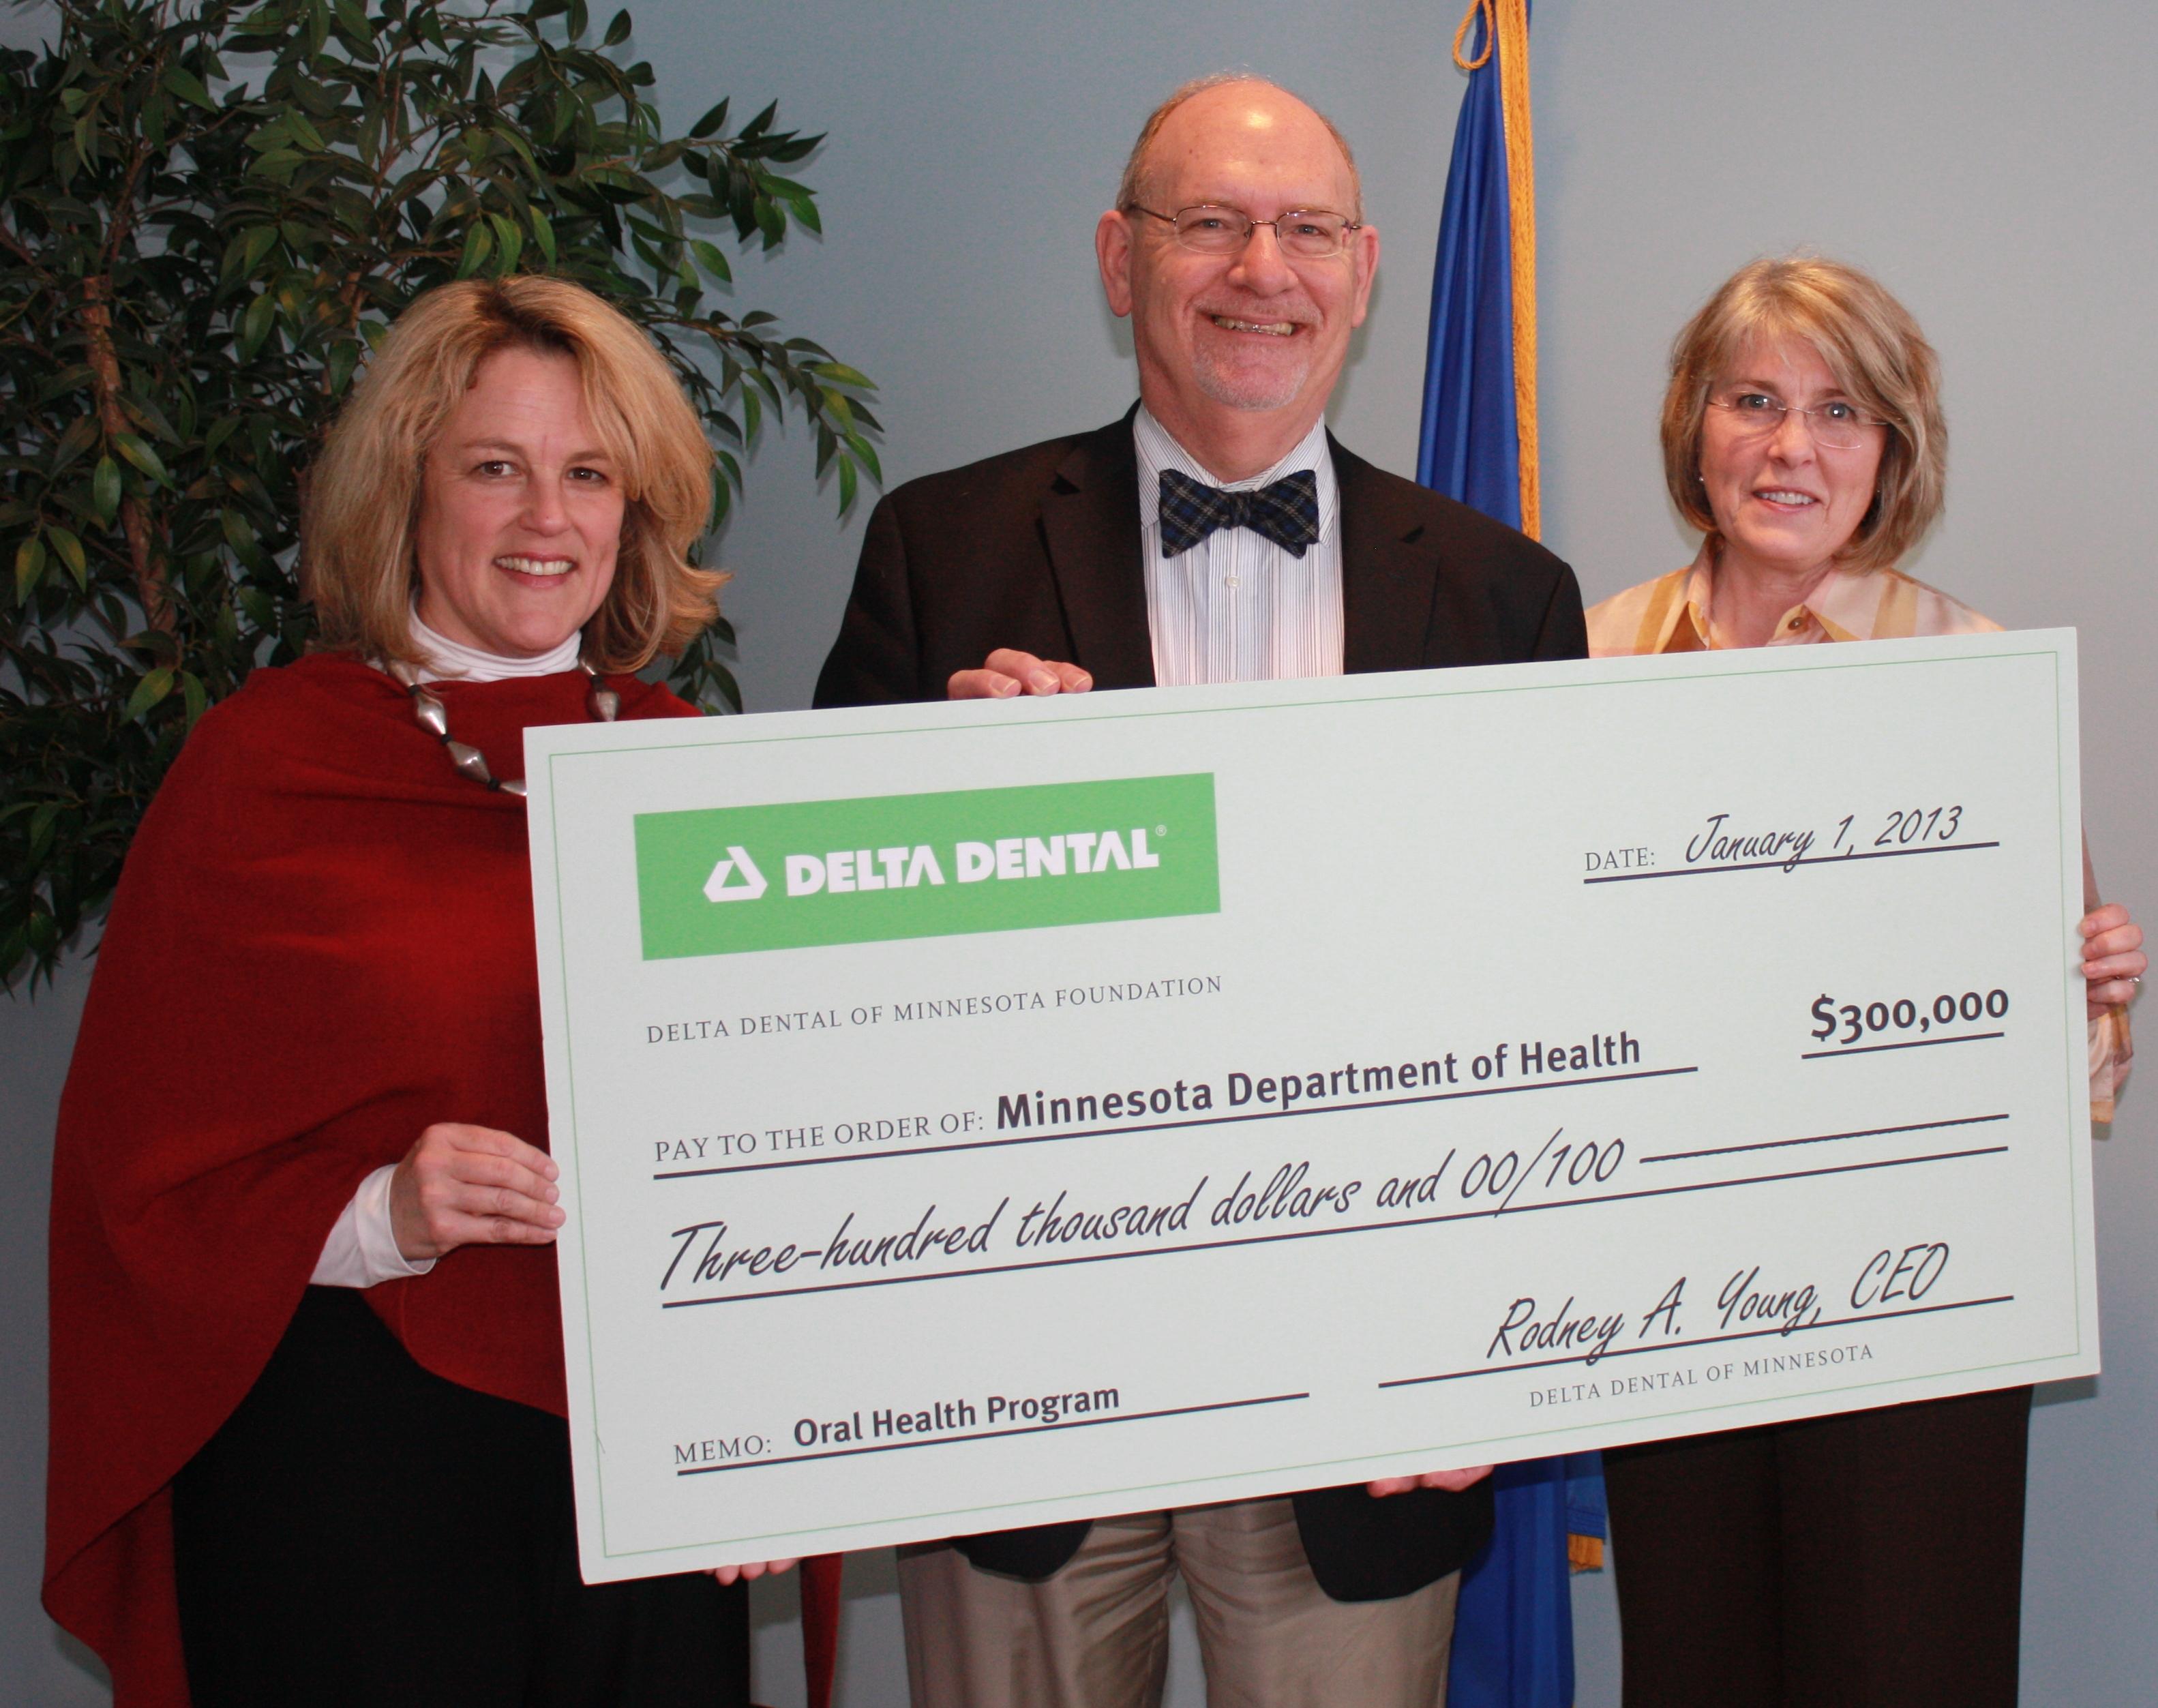 Delta Dental of Minnesota Foundation Funds a Public-Private